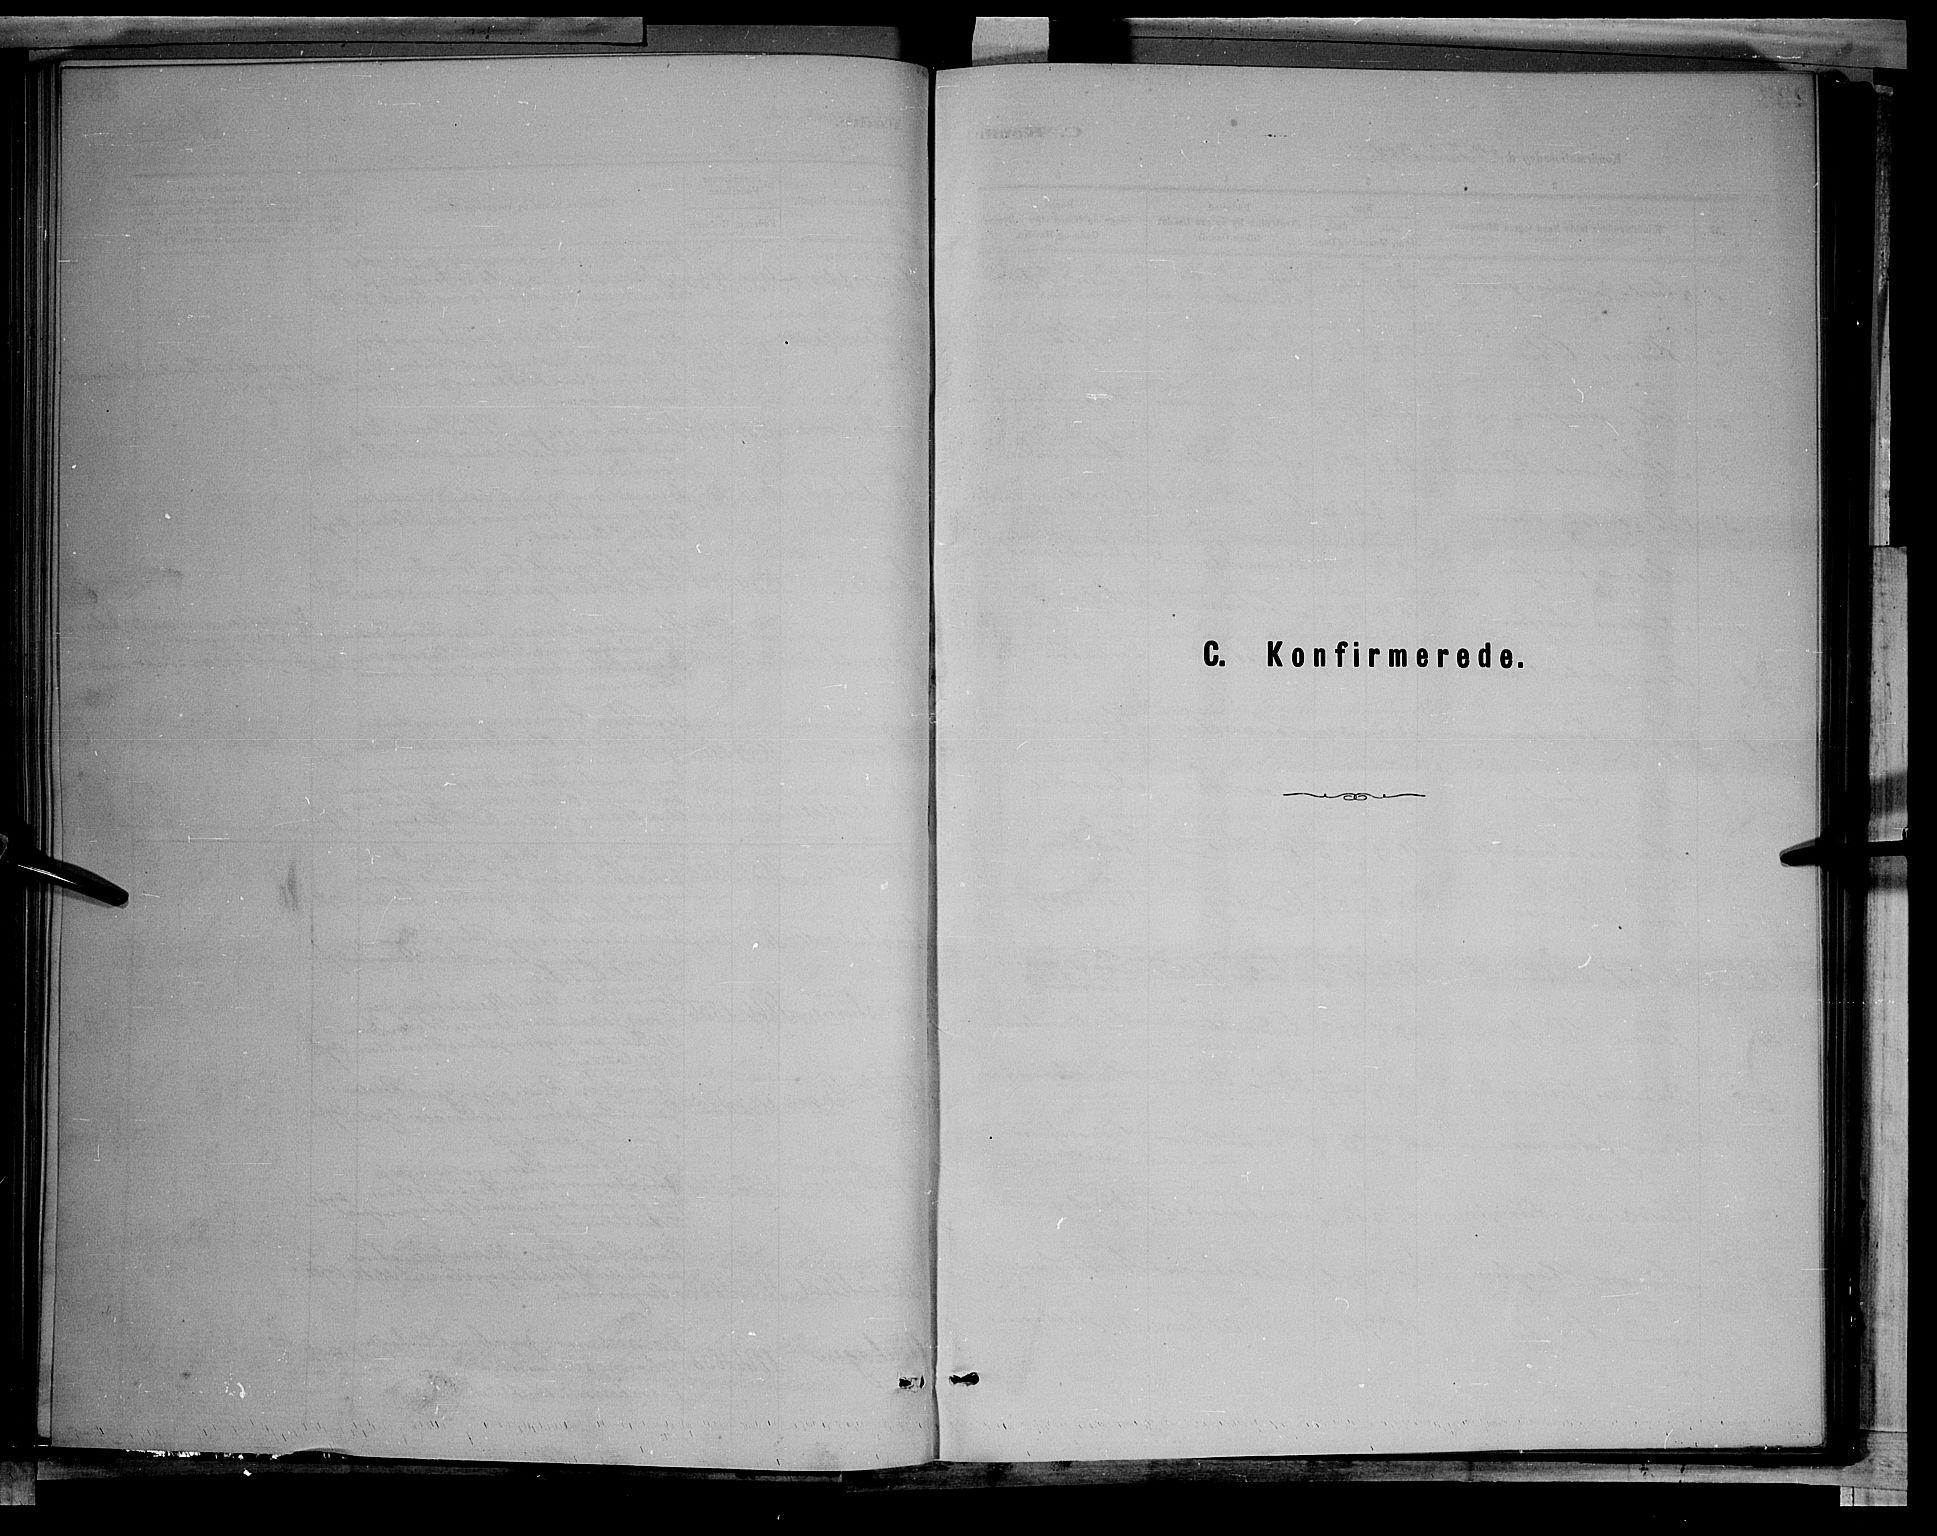 SAH, Sør-Fron prestekontor, H/Ha/Hab/L0003: Klokkerbok nr. 3, 1884-1896